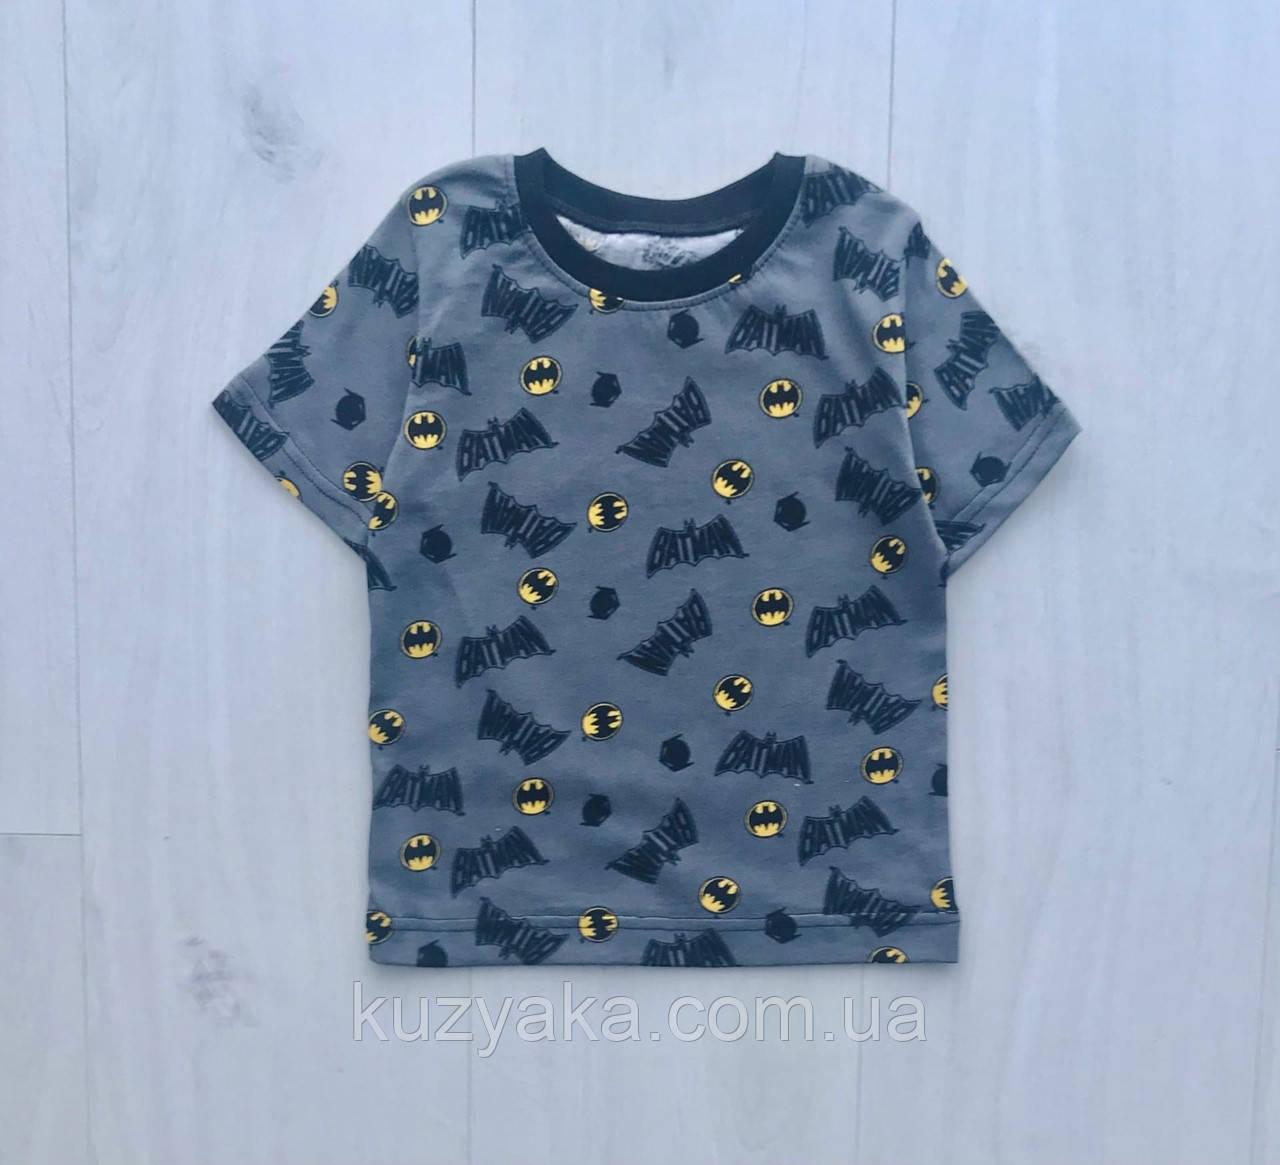 Дитяча футболка Бетмен для хлопчика на зріст 86-128 см